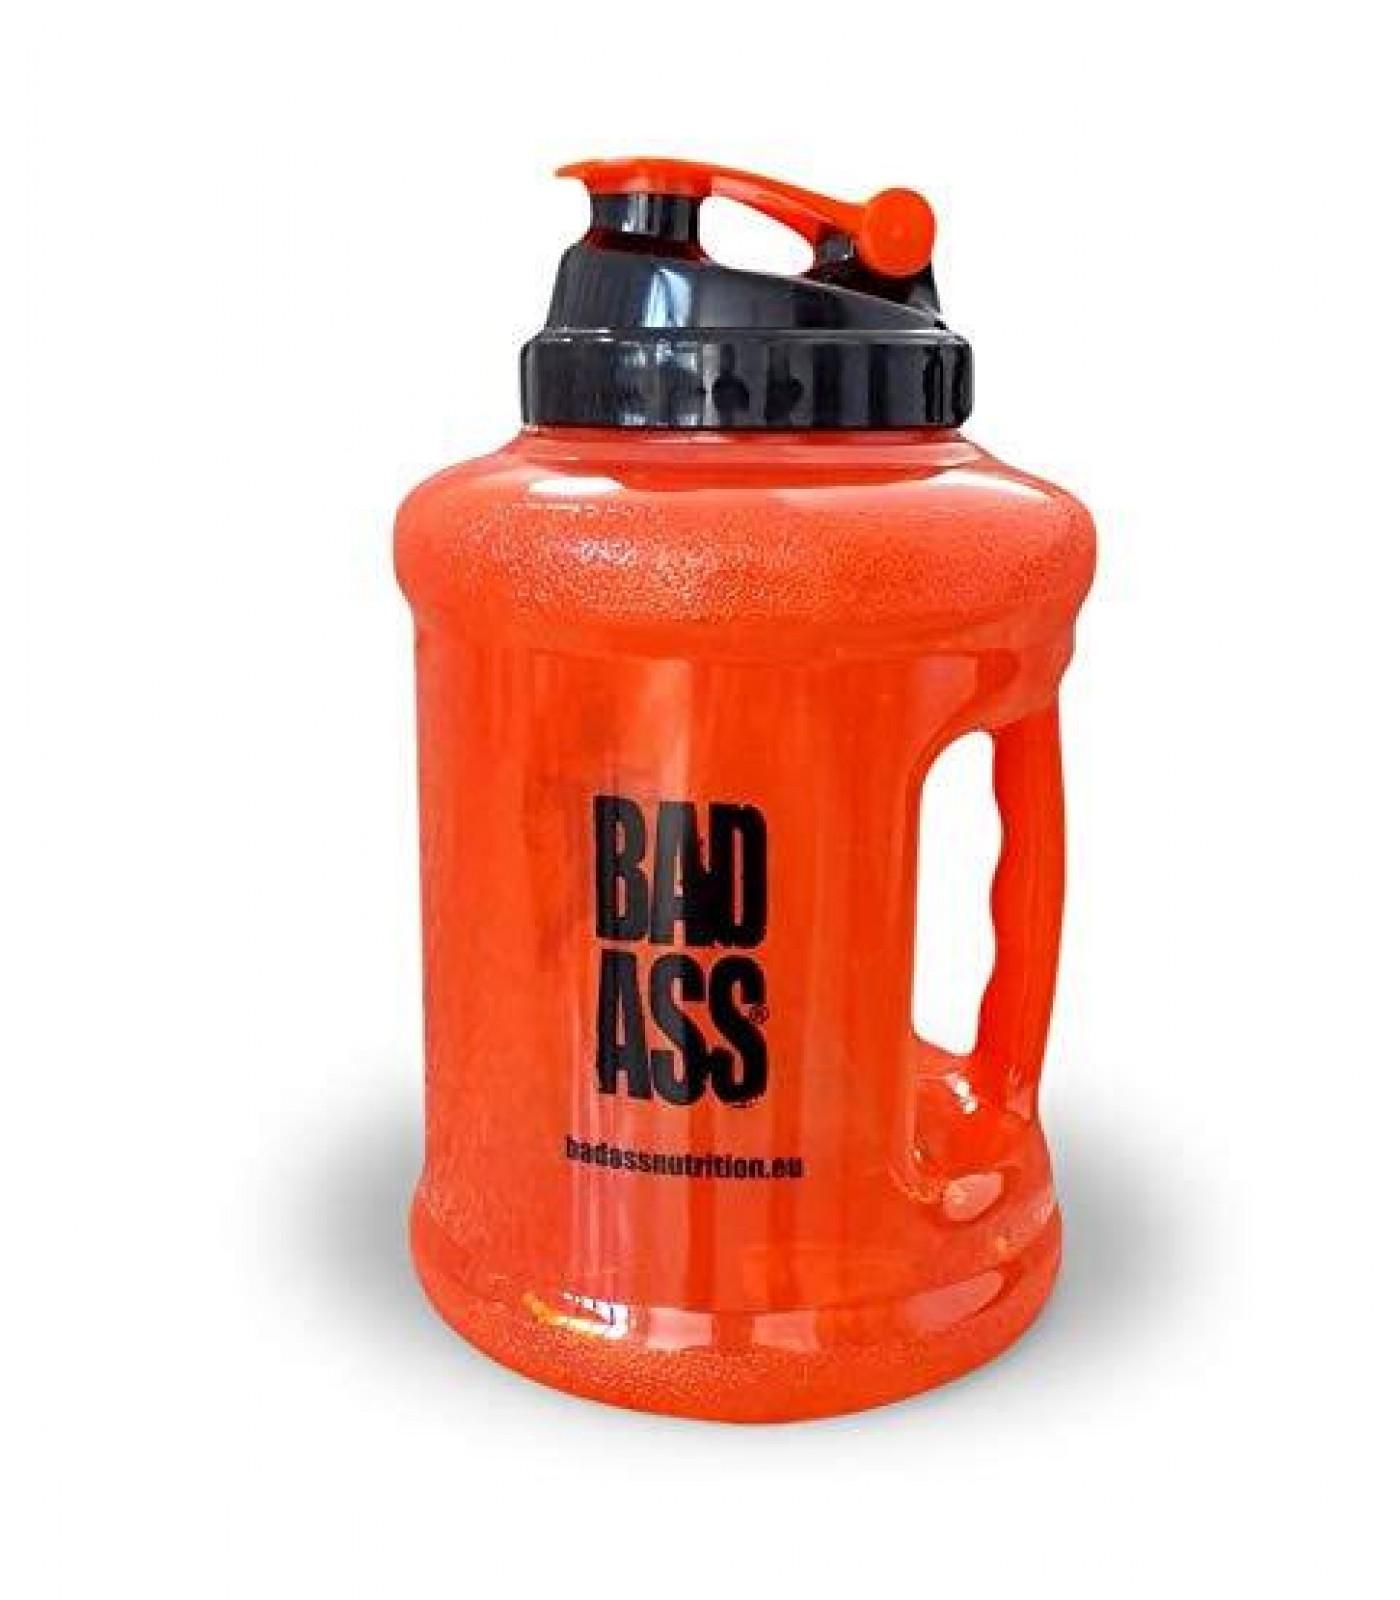 BAD ASS - BAD ASS / Water Jug